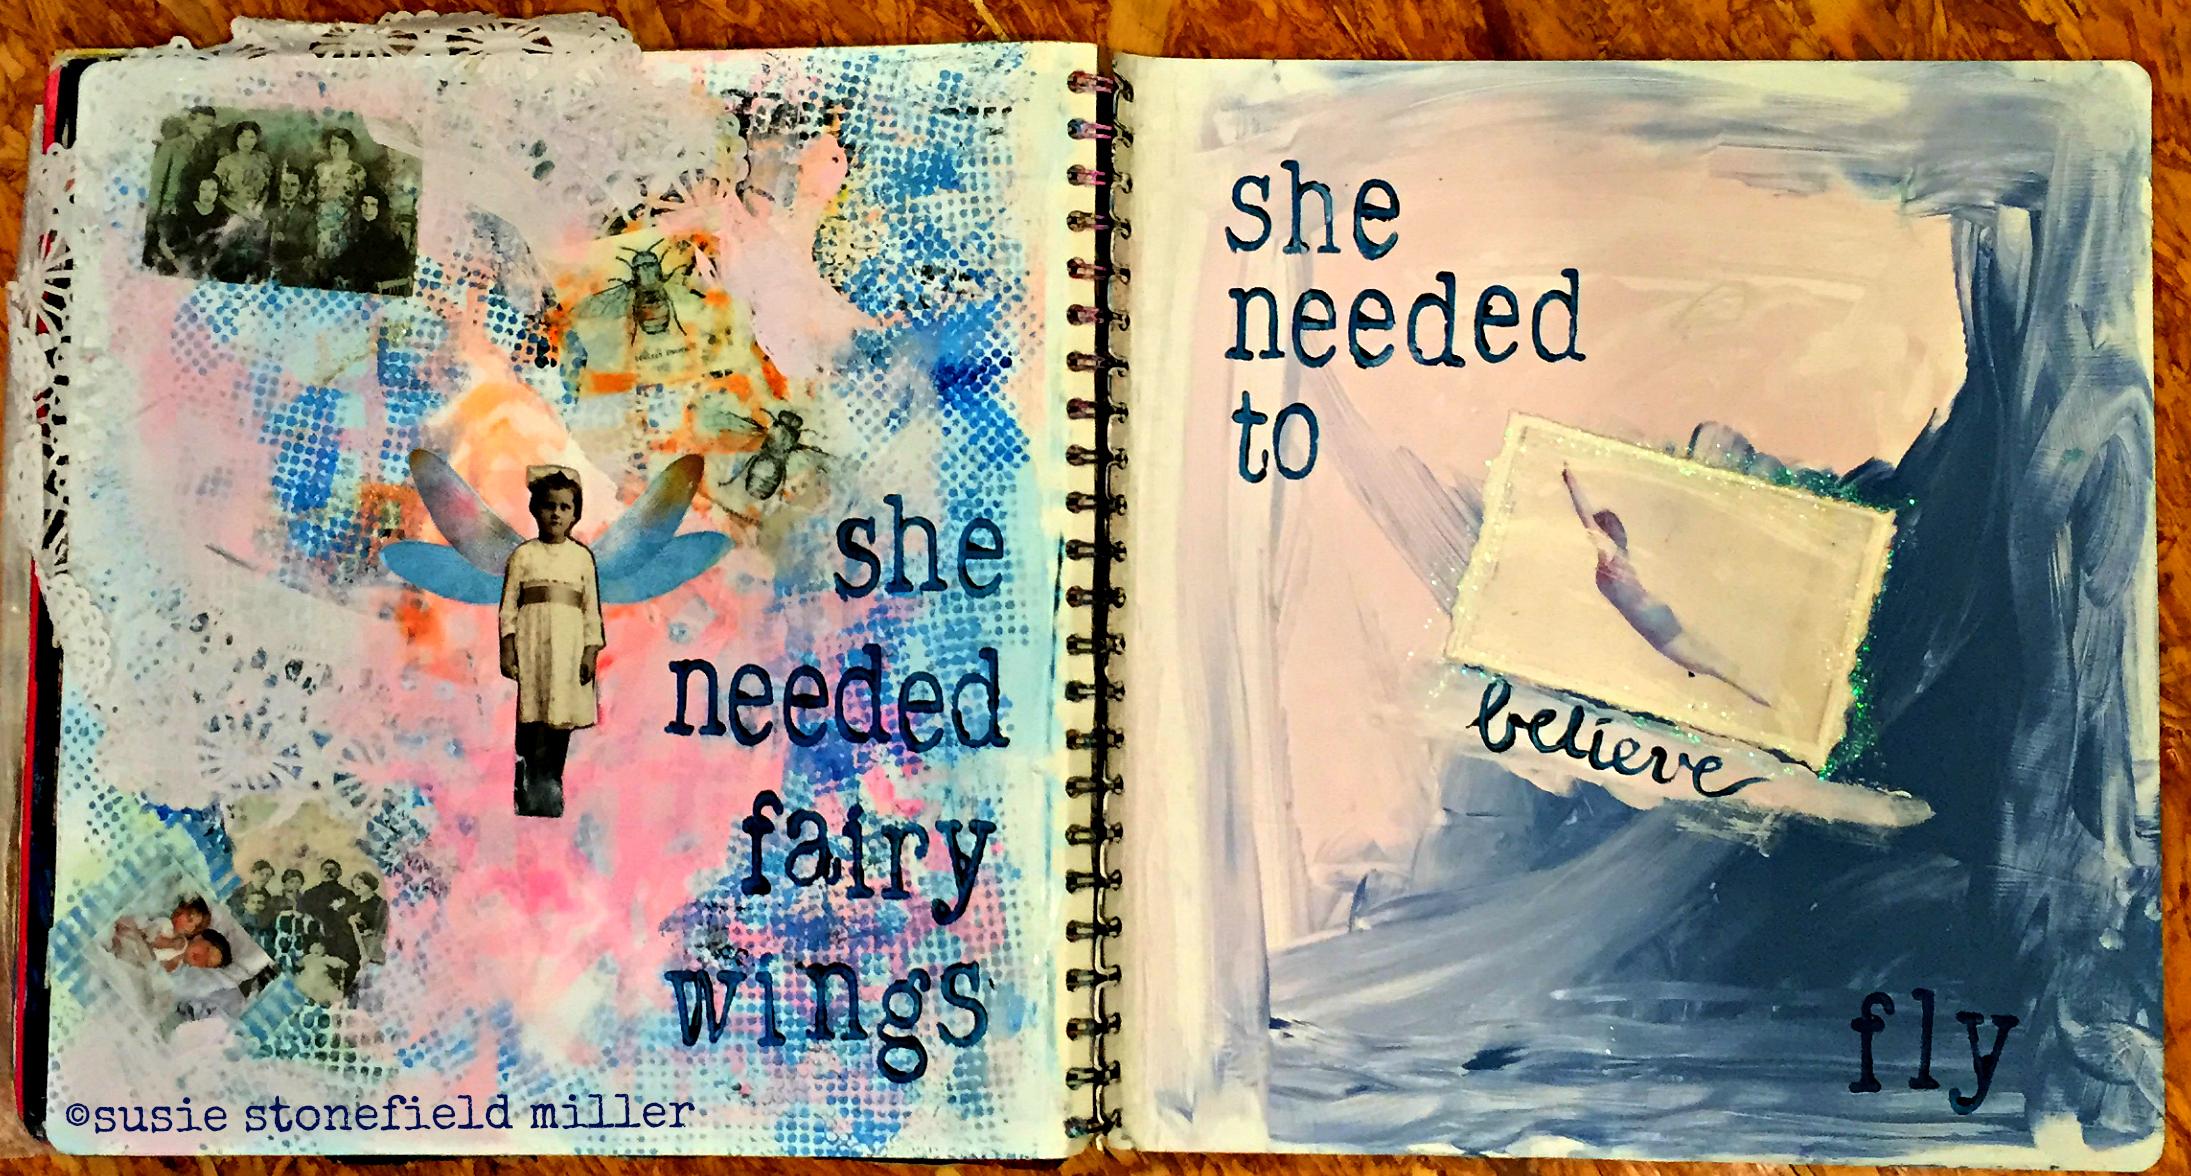 she needed fairy wings wm.jpg